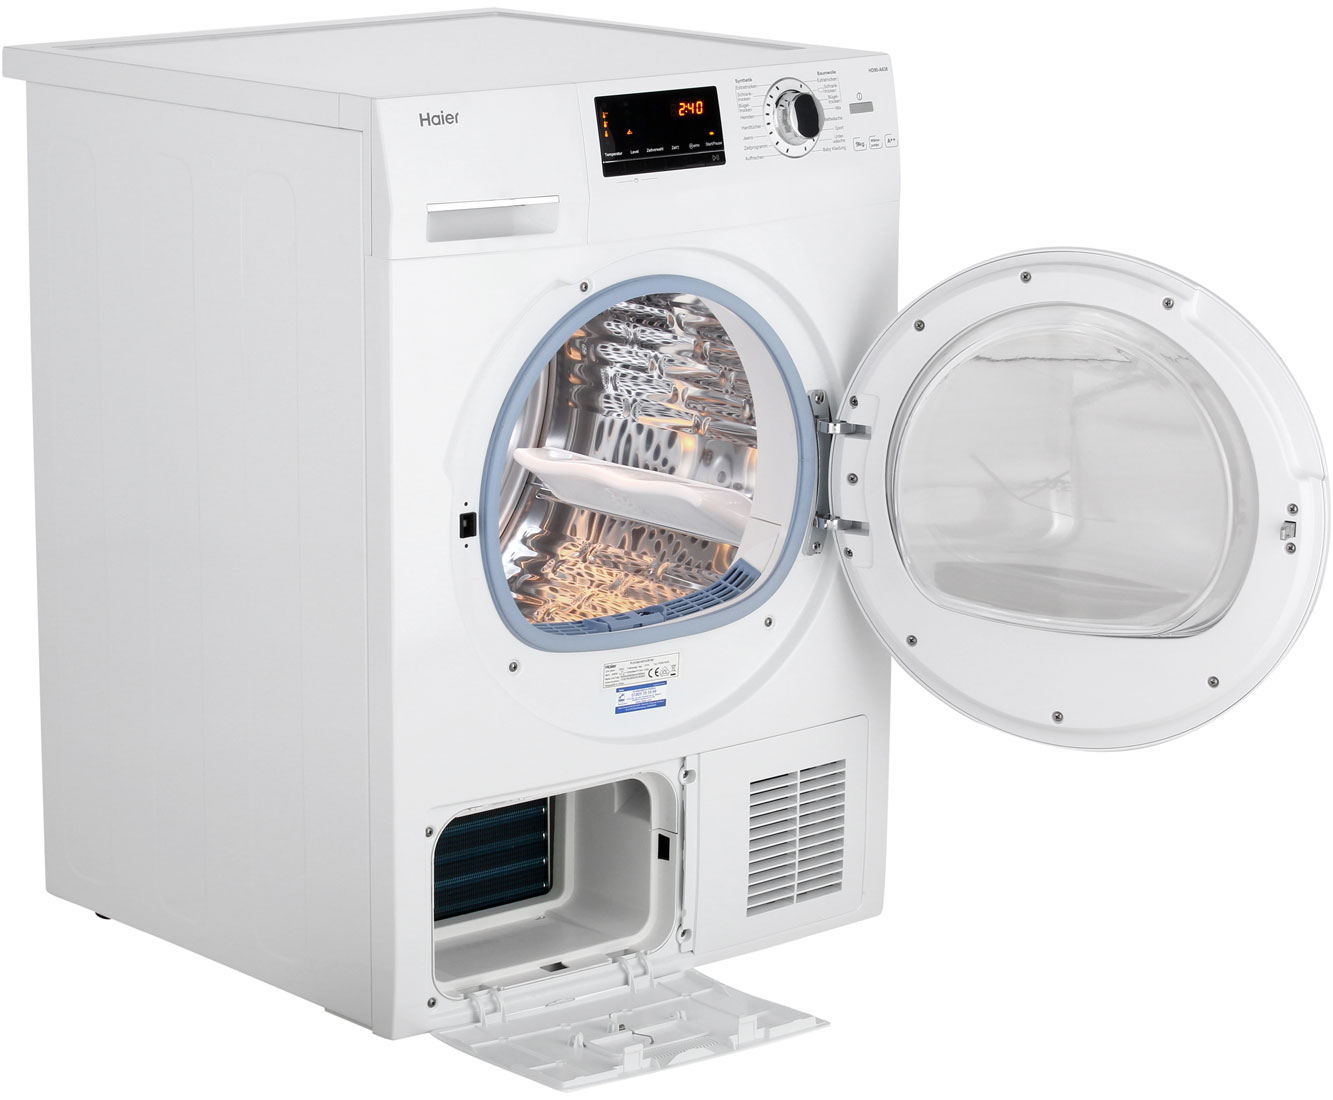 Haier hd90 a636 wärmepumpentrockner 9 kg weiß a